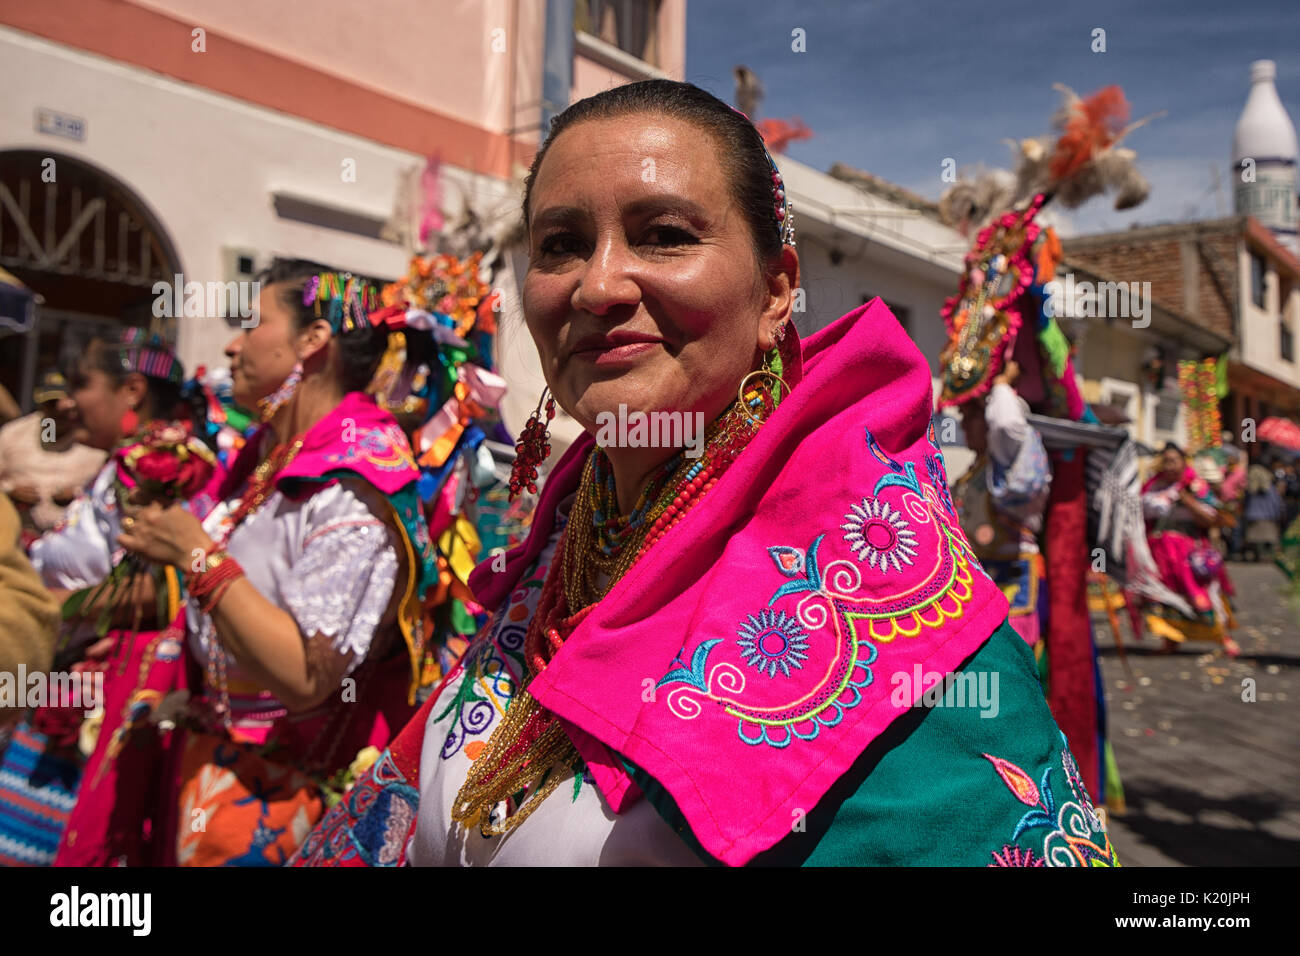 June 17, 2017 Pujili, Ecuador: indigenous kichwa woman in colorful traditional clothing at the Corpus Christi parade - Stock Image